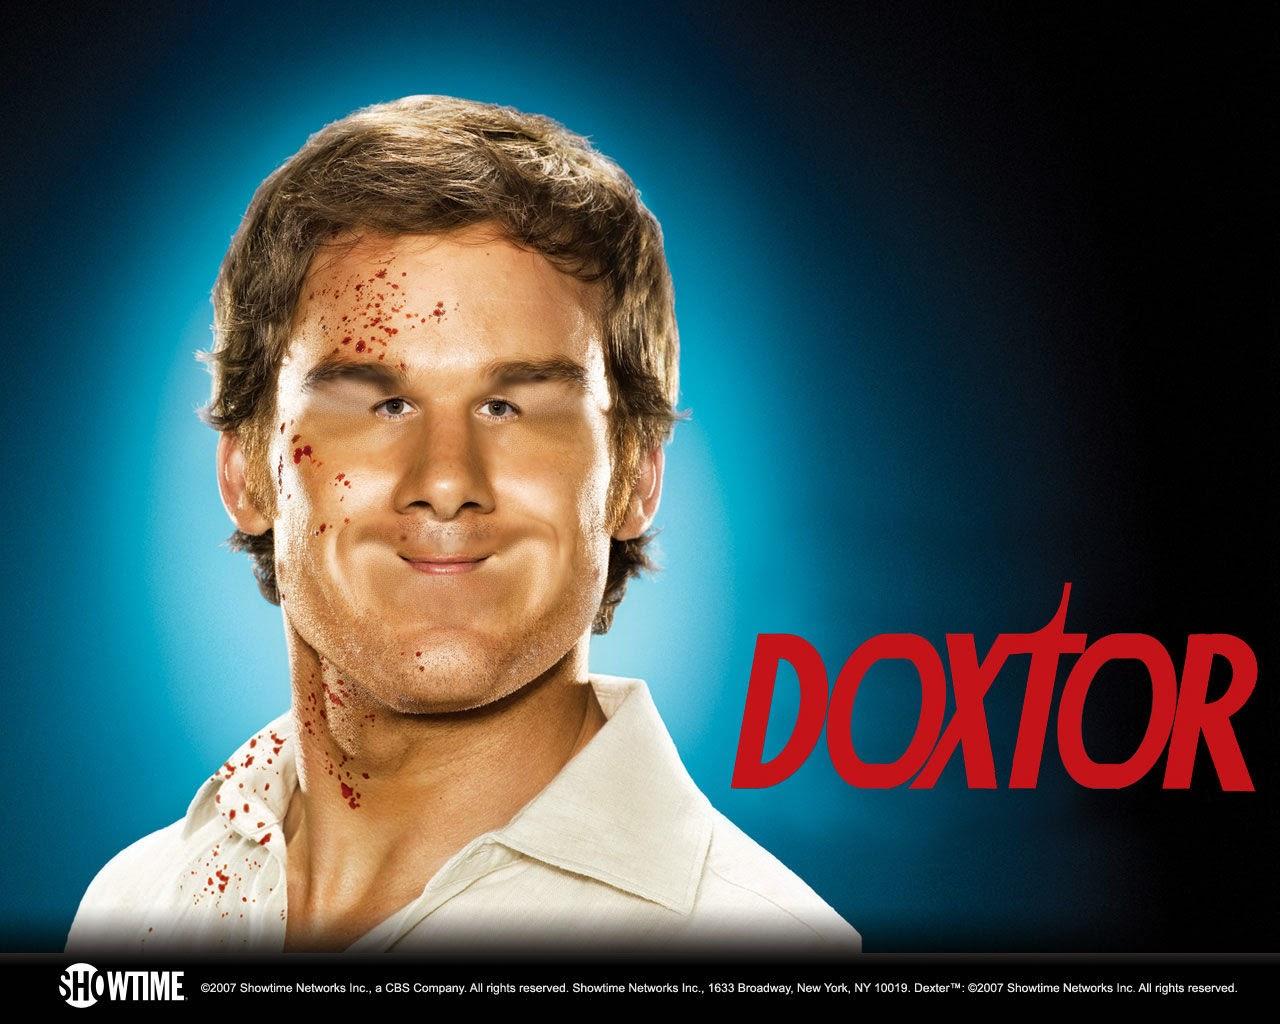 Doxtor